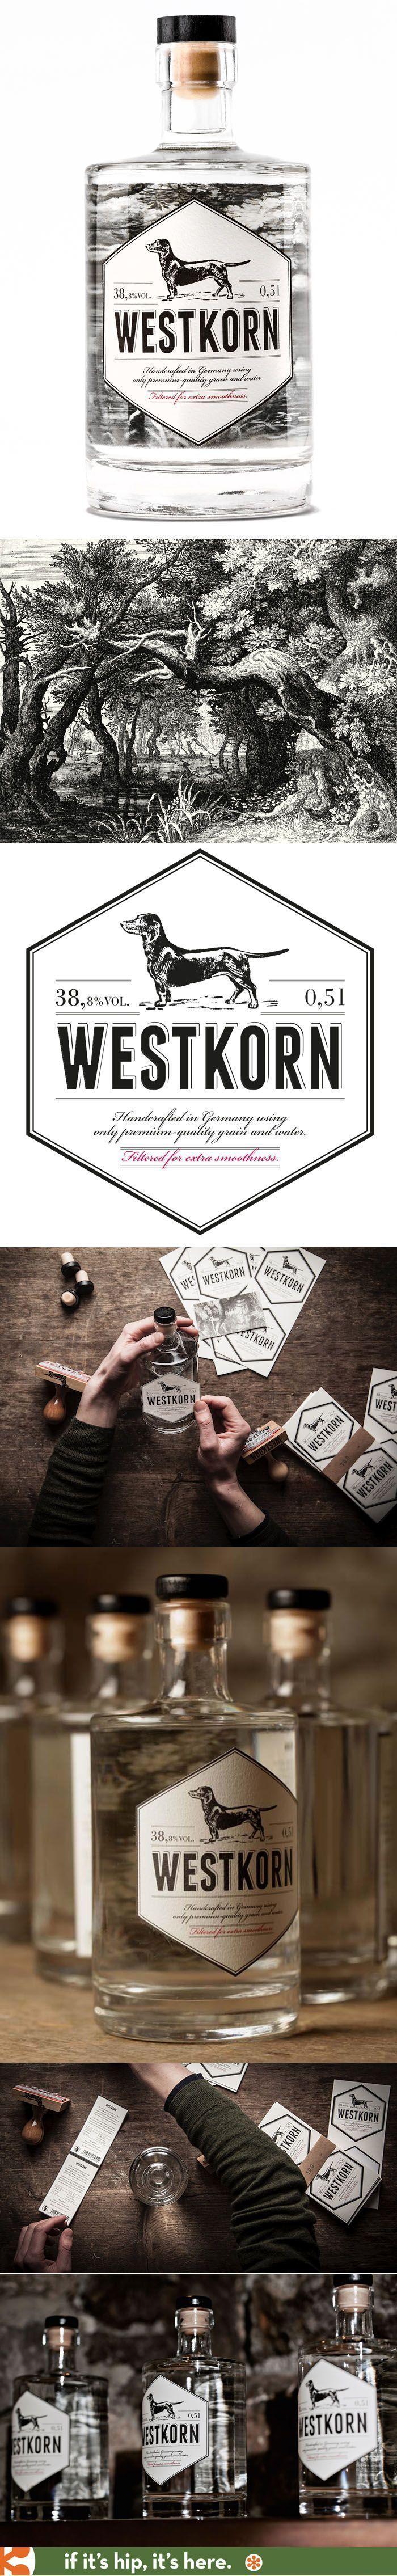 38 best packaging inspiration images on pinterest design